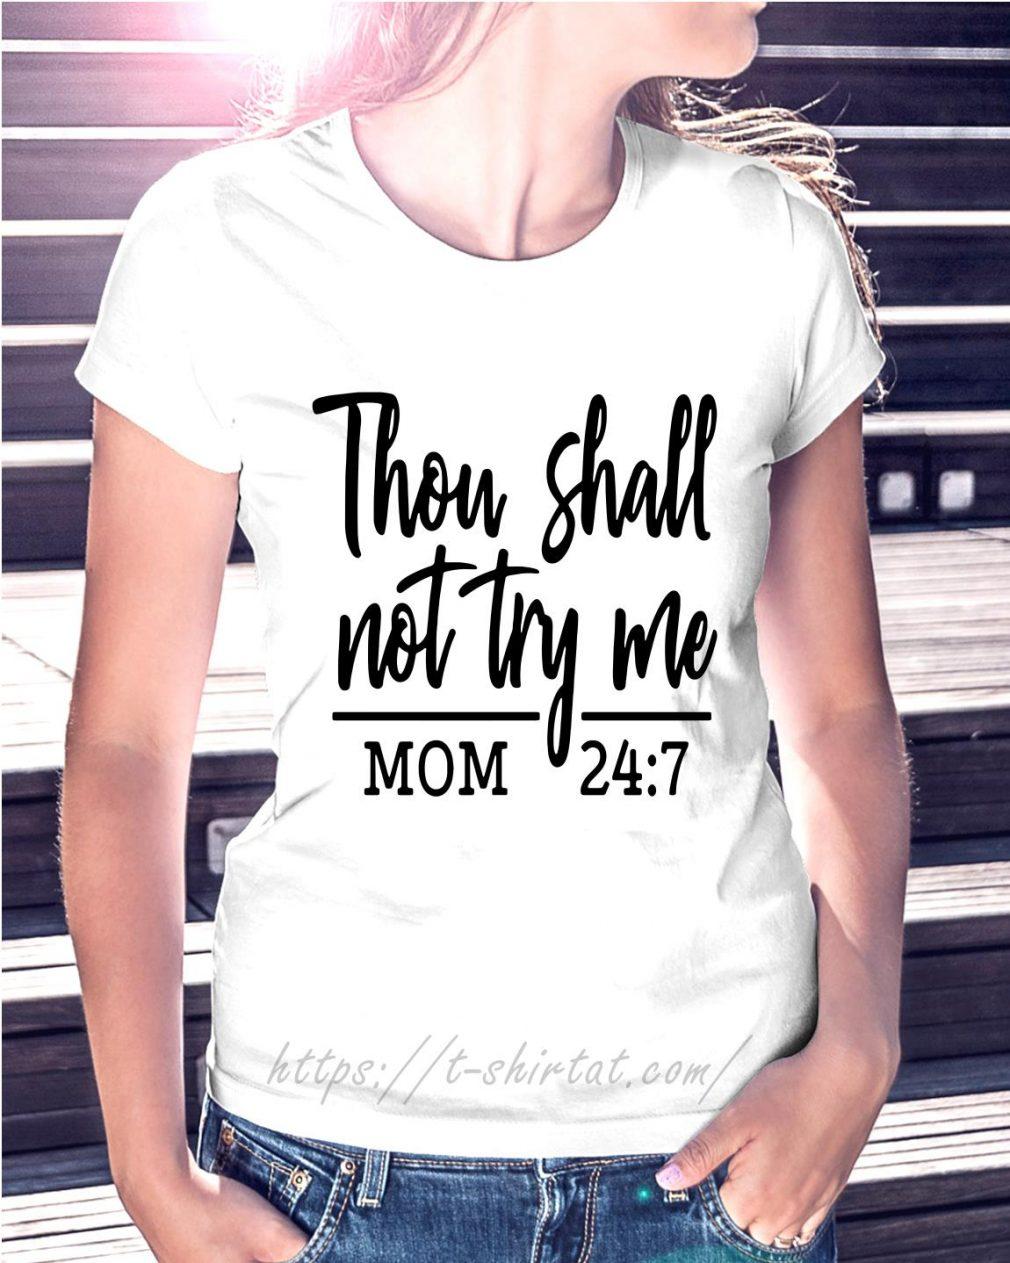 Thou shalt not try me mom 24:7 Ladies Tee